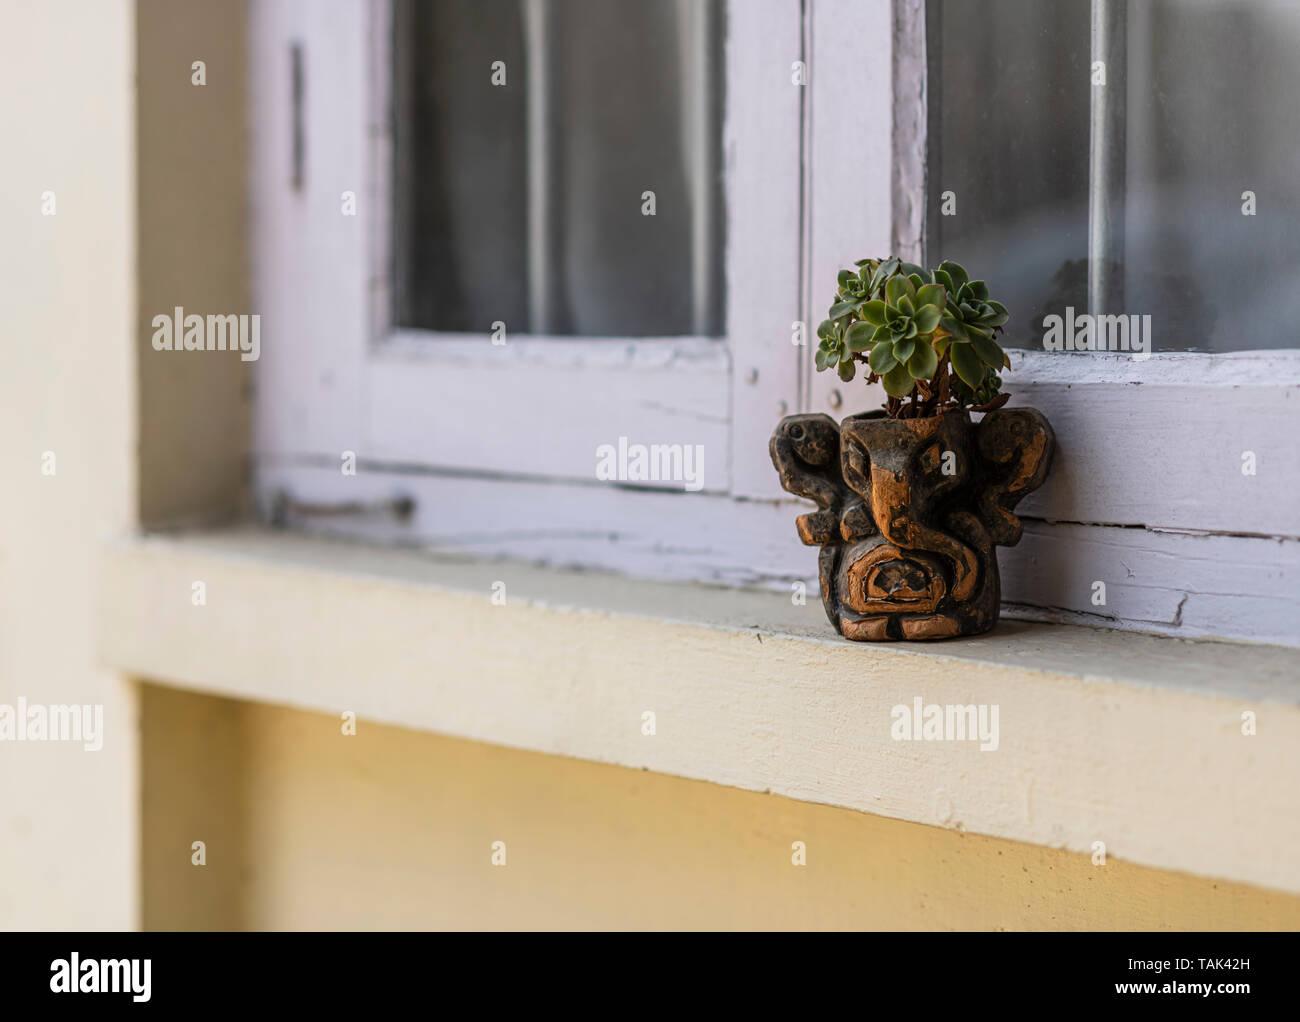 Echeveria A Succulent Growing In A Garden Pot Plant Pot Resting